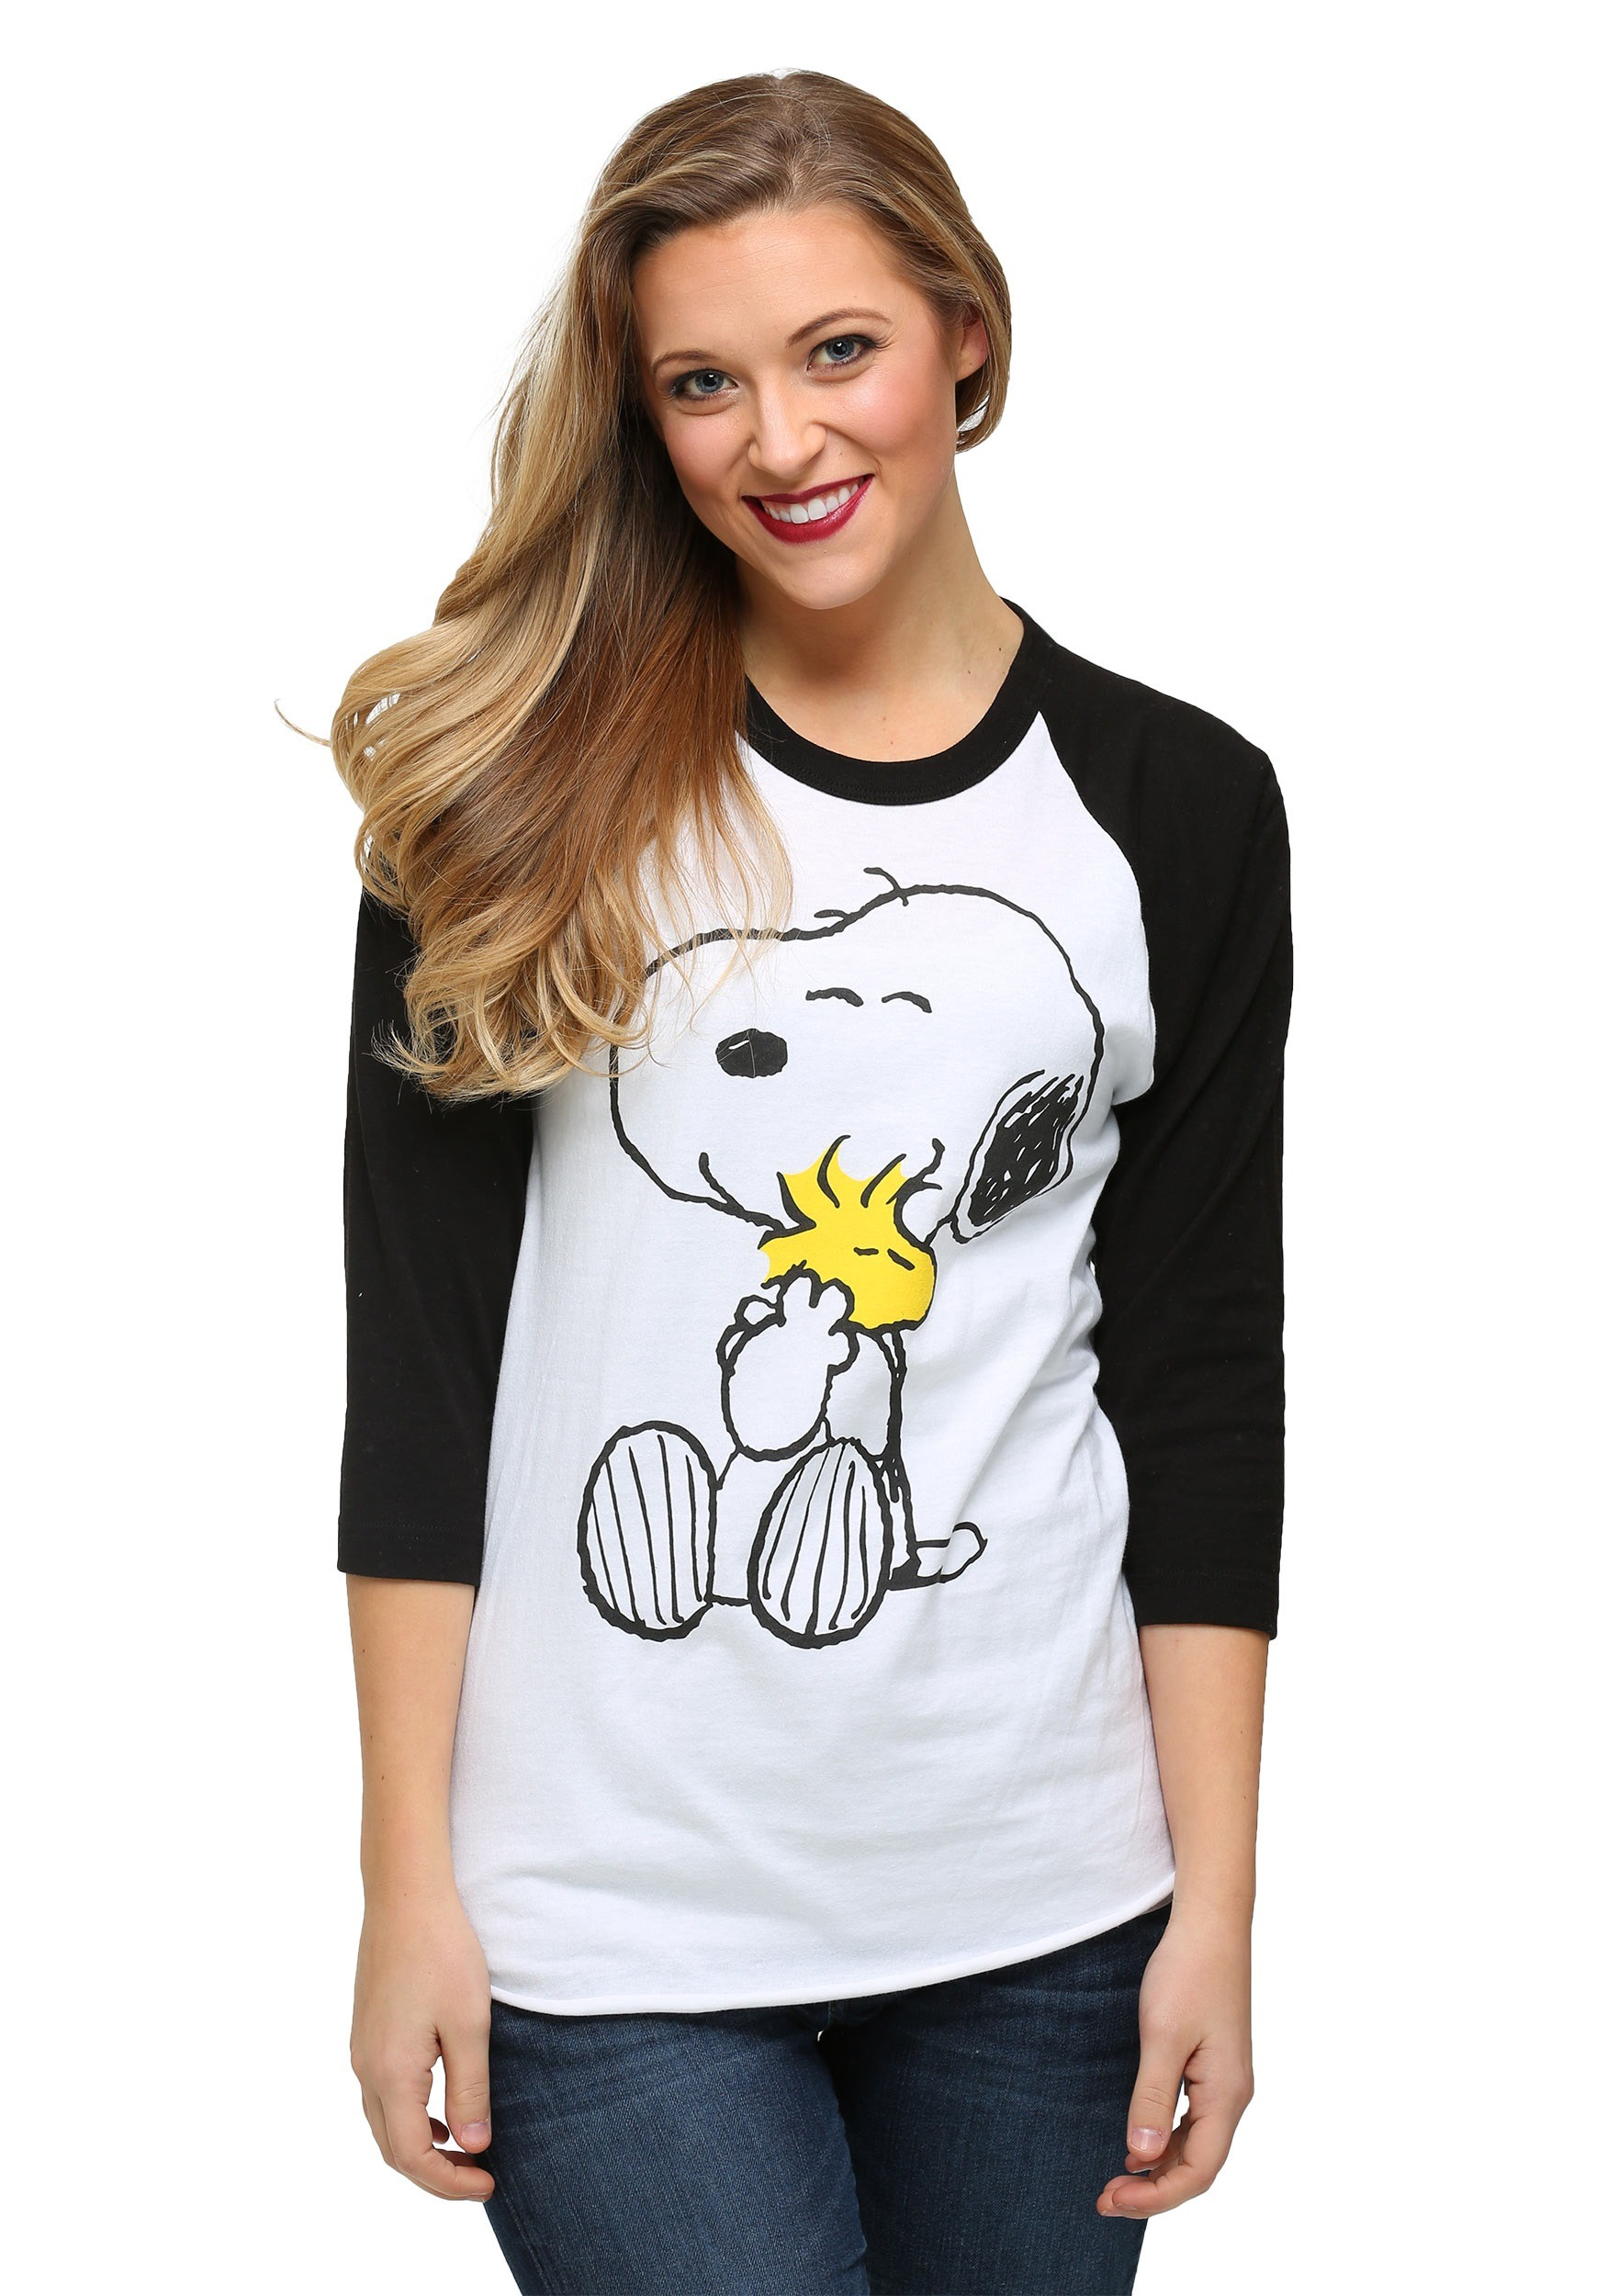 7b8526573 Peanuts Snoopy And Woodstock Hugging Juniors Raglan Shirt